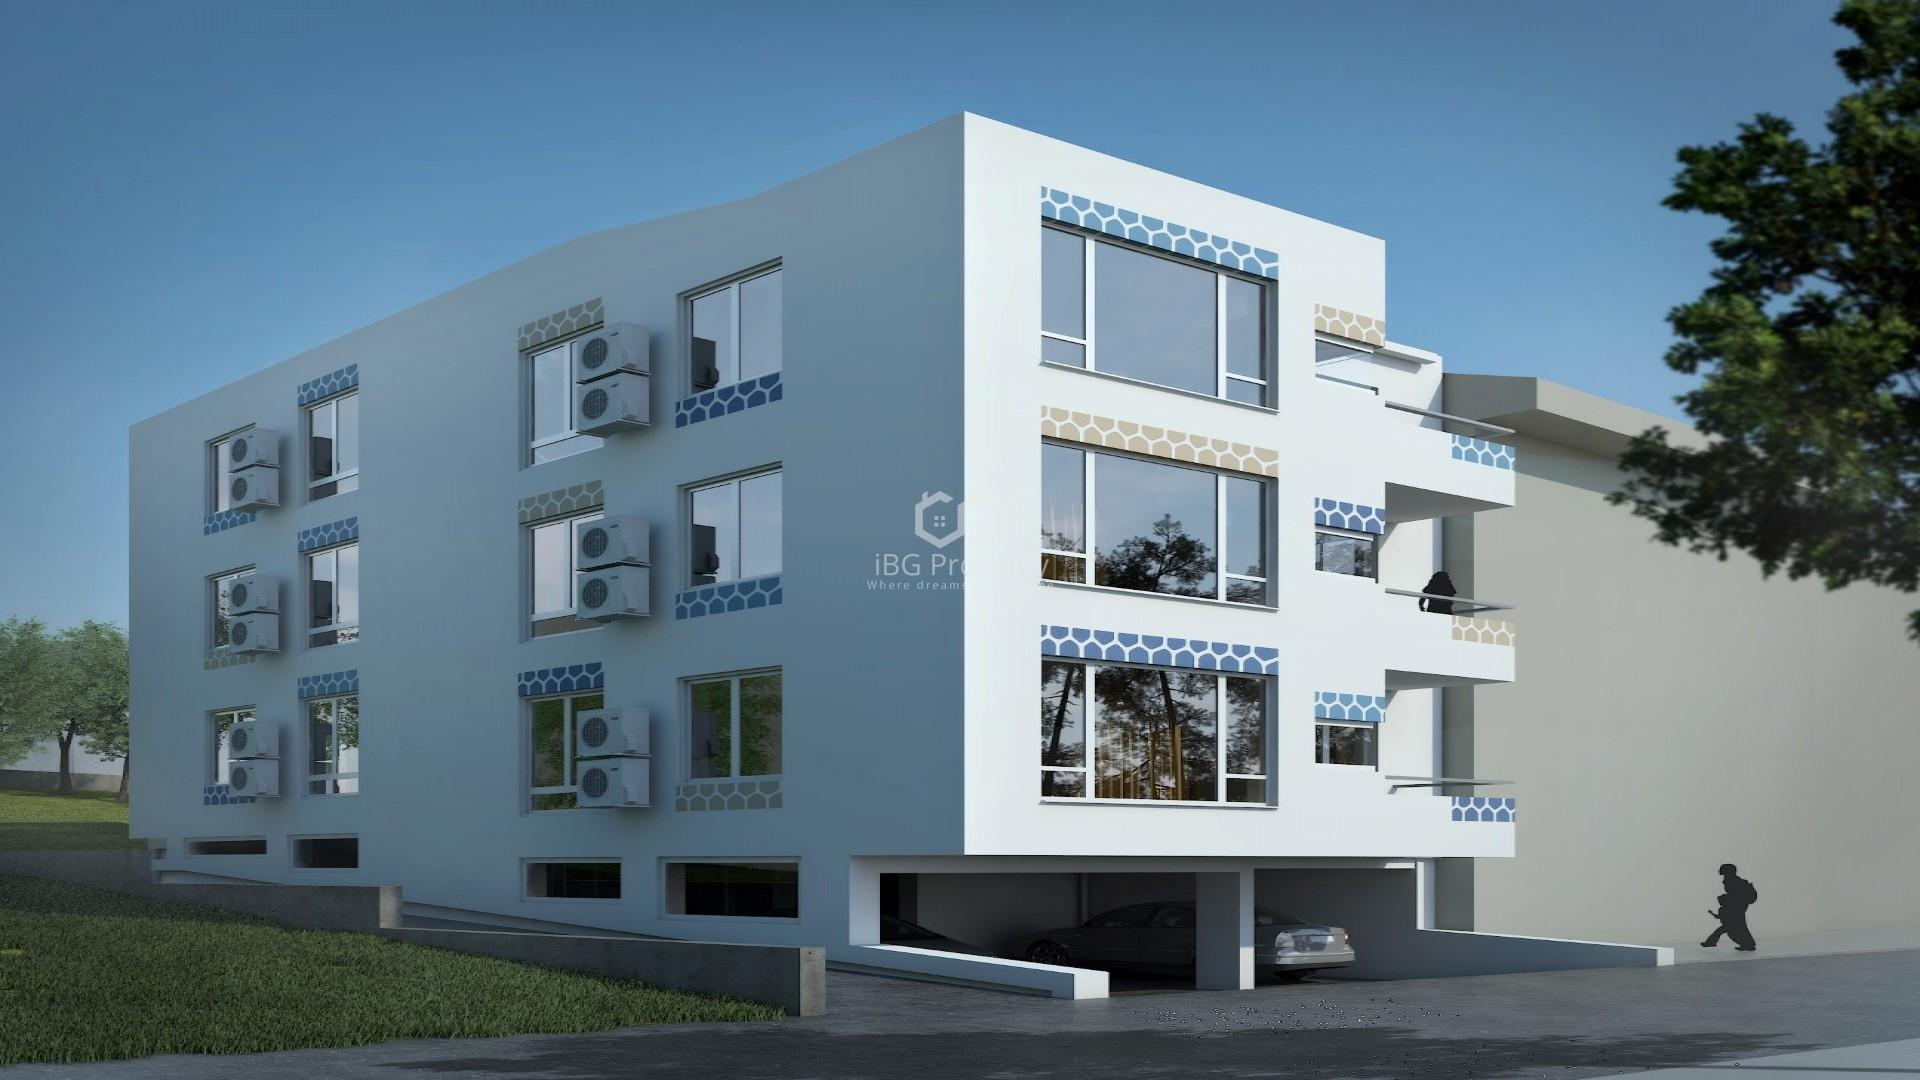 Dreizimmerwohnung in Vinitsa, Varna 99 m2